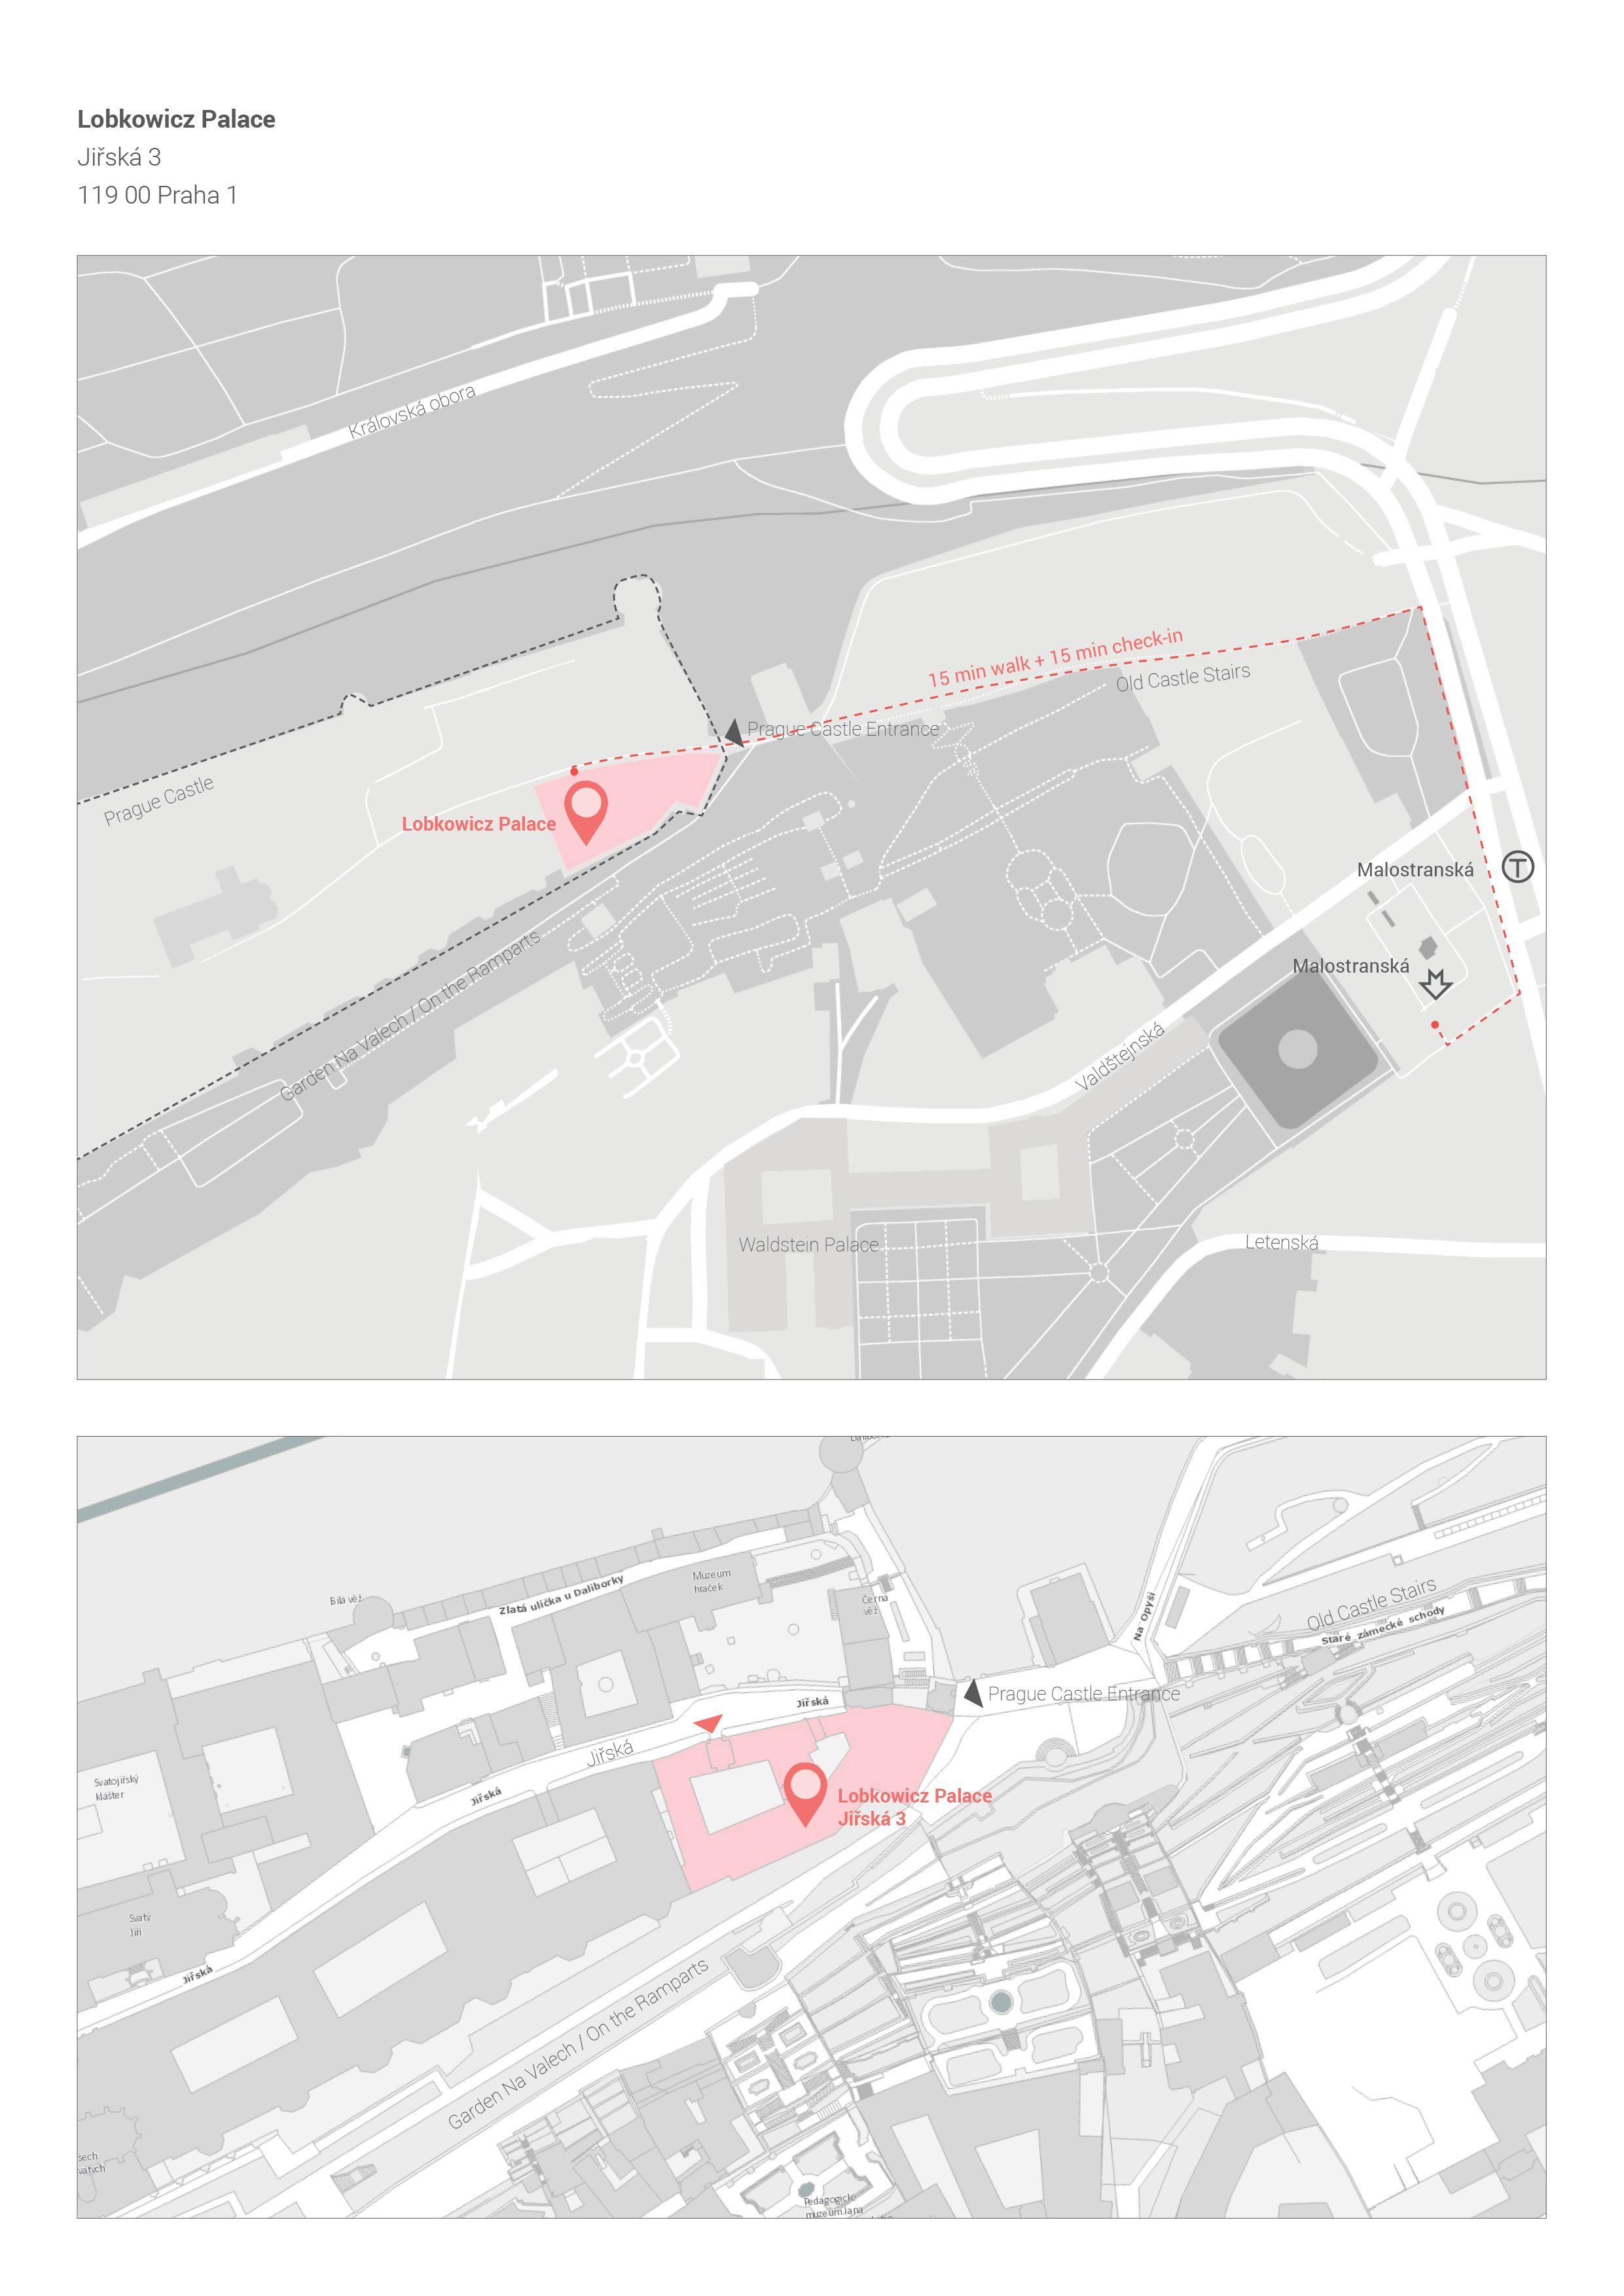 AIA_Prague_locations-17-09-296.jpg